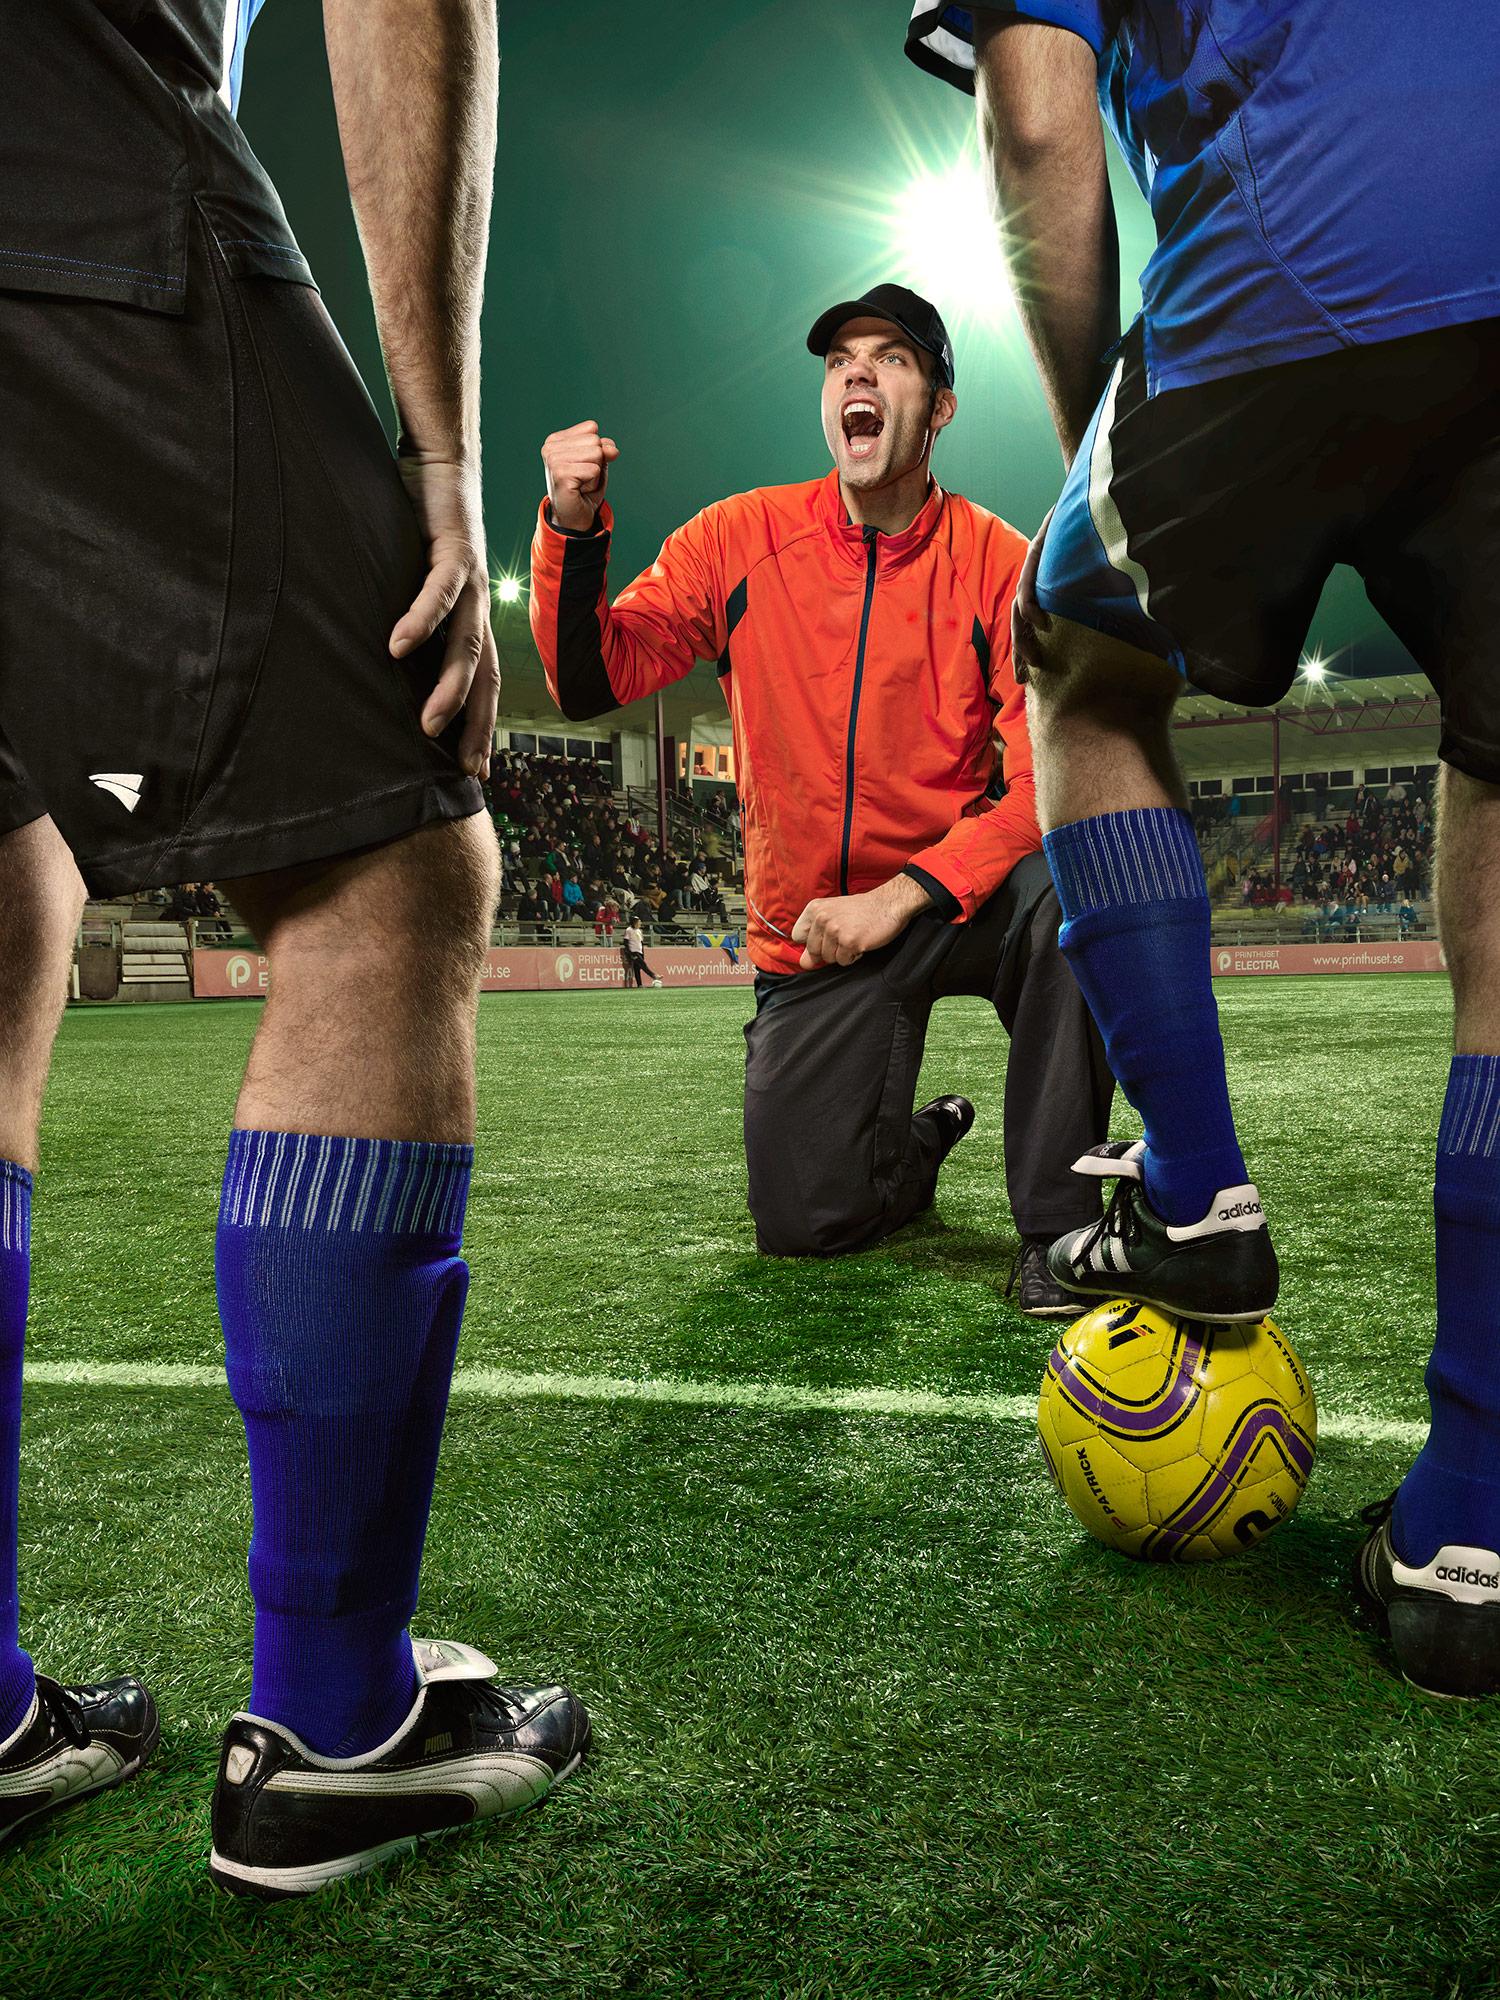 ar_fotboll_what_matters.jpg